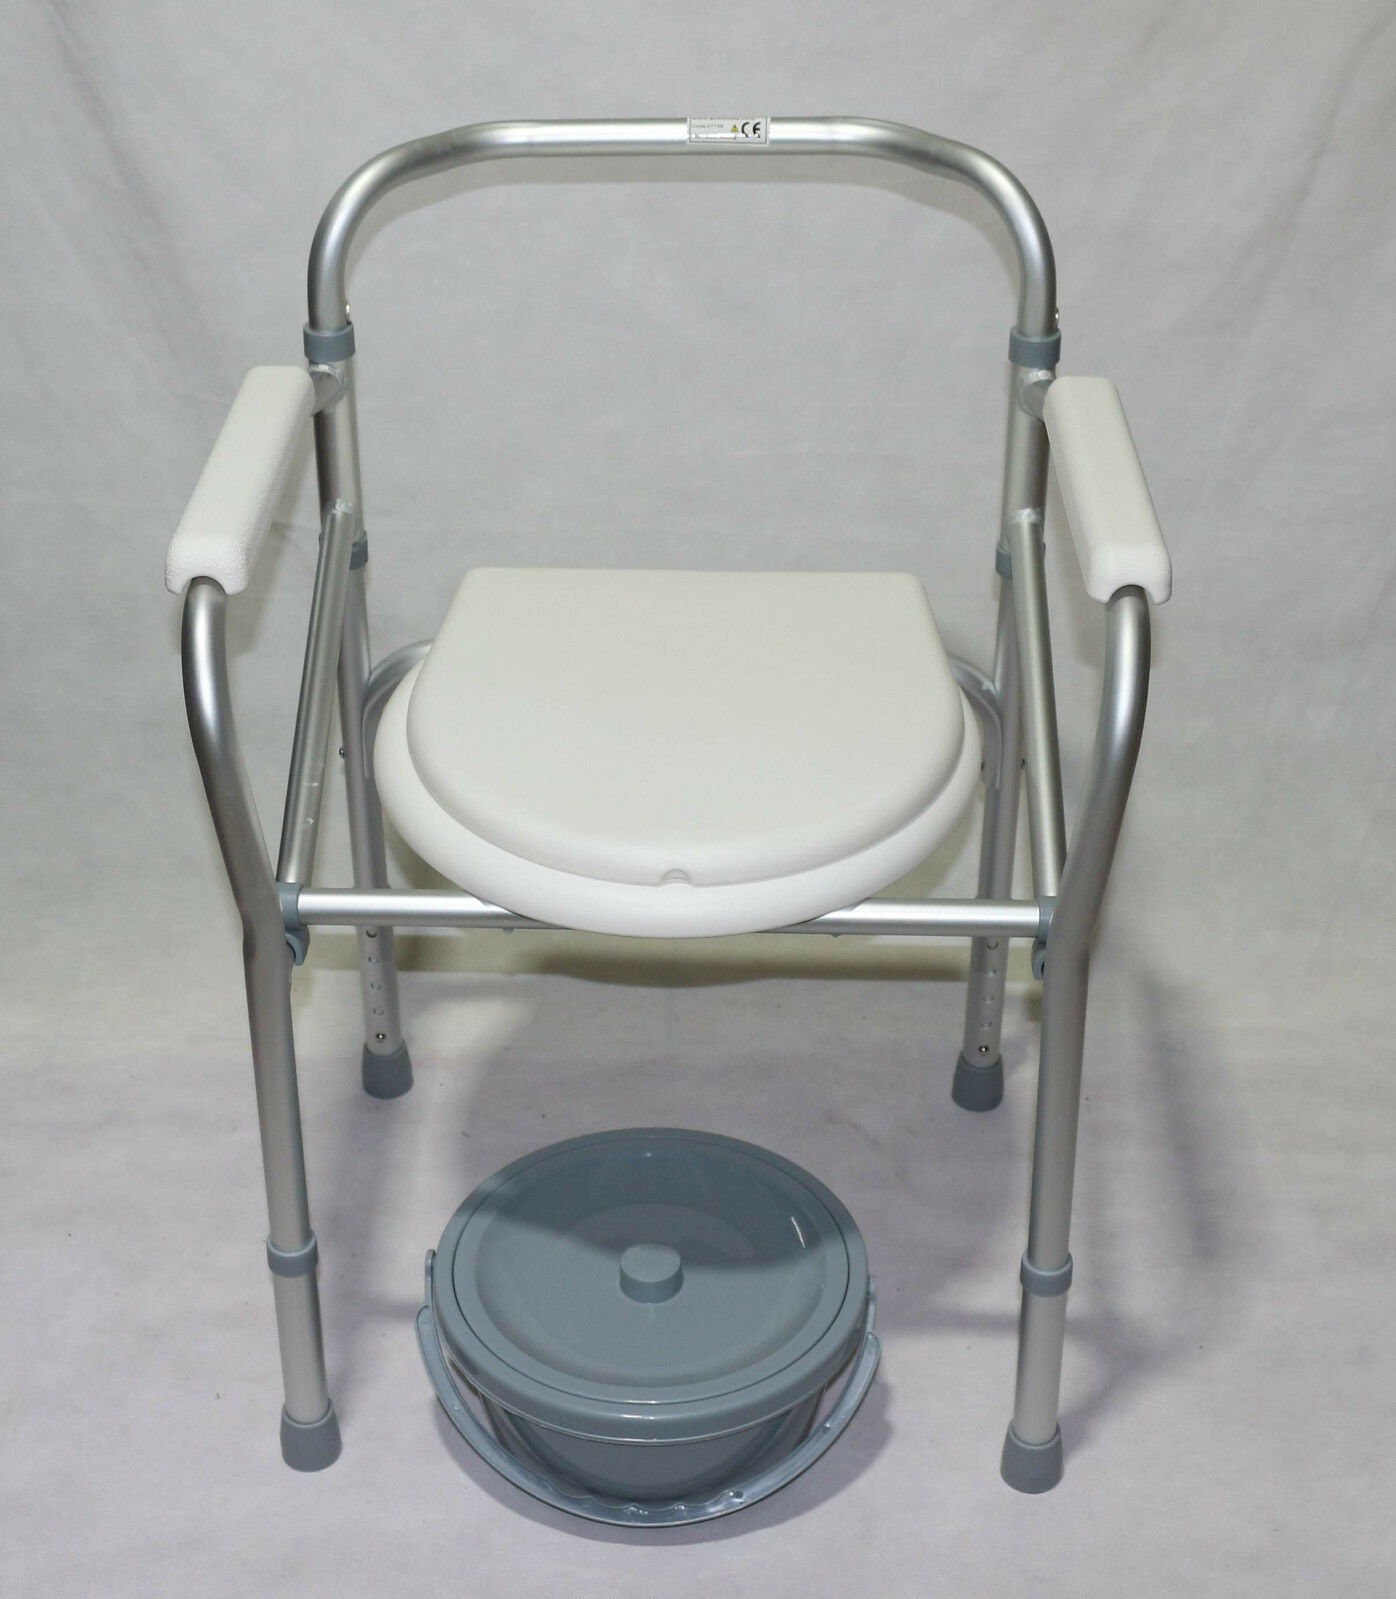 Gima 27759 Komfortable wc-doccia  höhe verstellbar (F524S17)